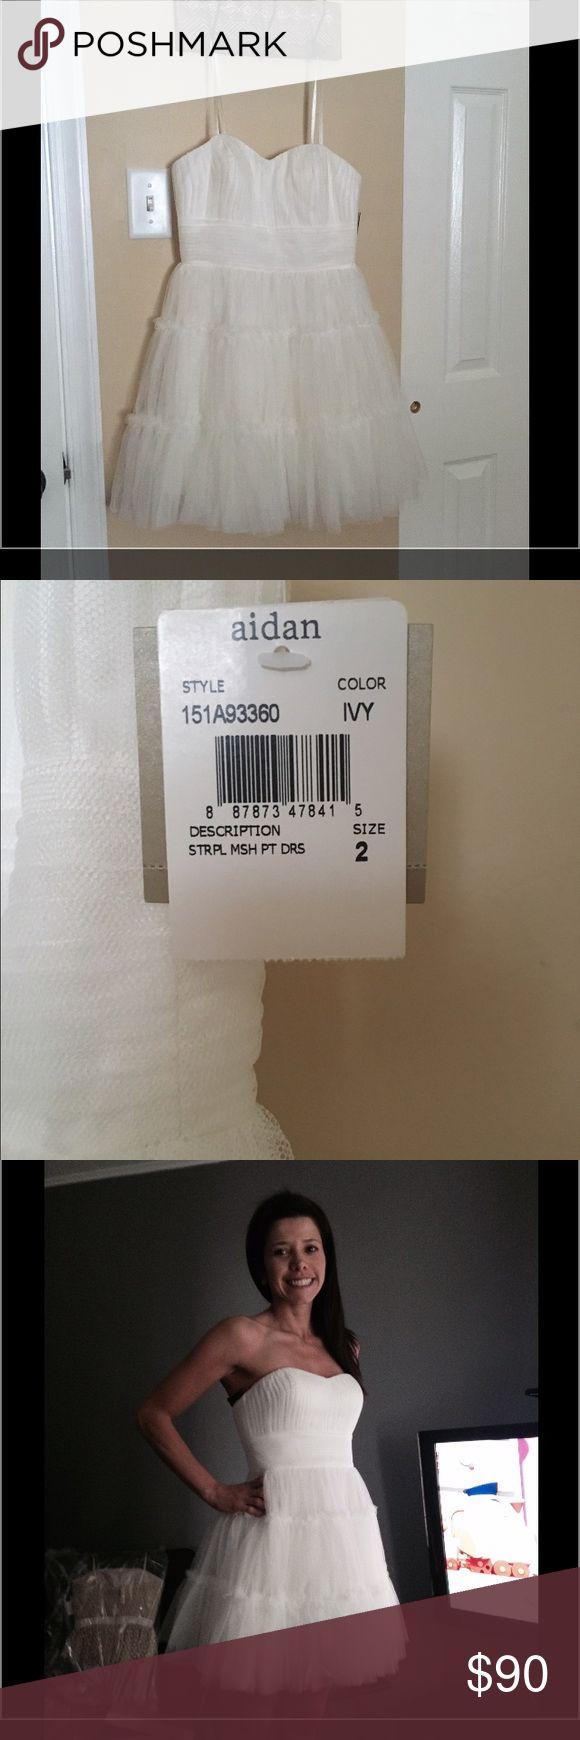 Aidan Mattox Strapless Mesh Party Dress Size 2 New Aidan Mattox Strapless Mesh Party Dress Size 2 Color Ivory Aidan Mattox Dresses Strapless